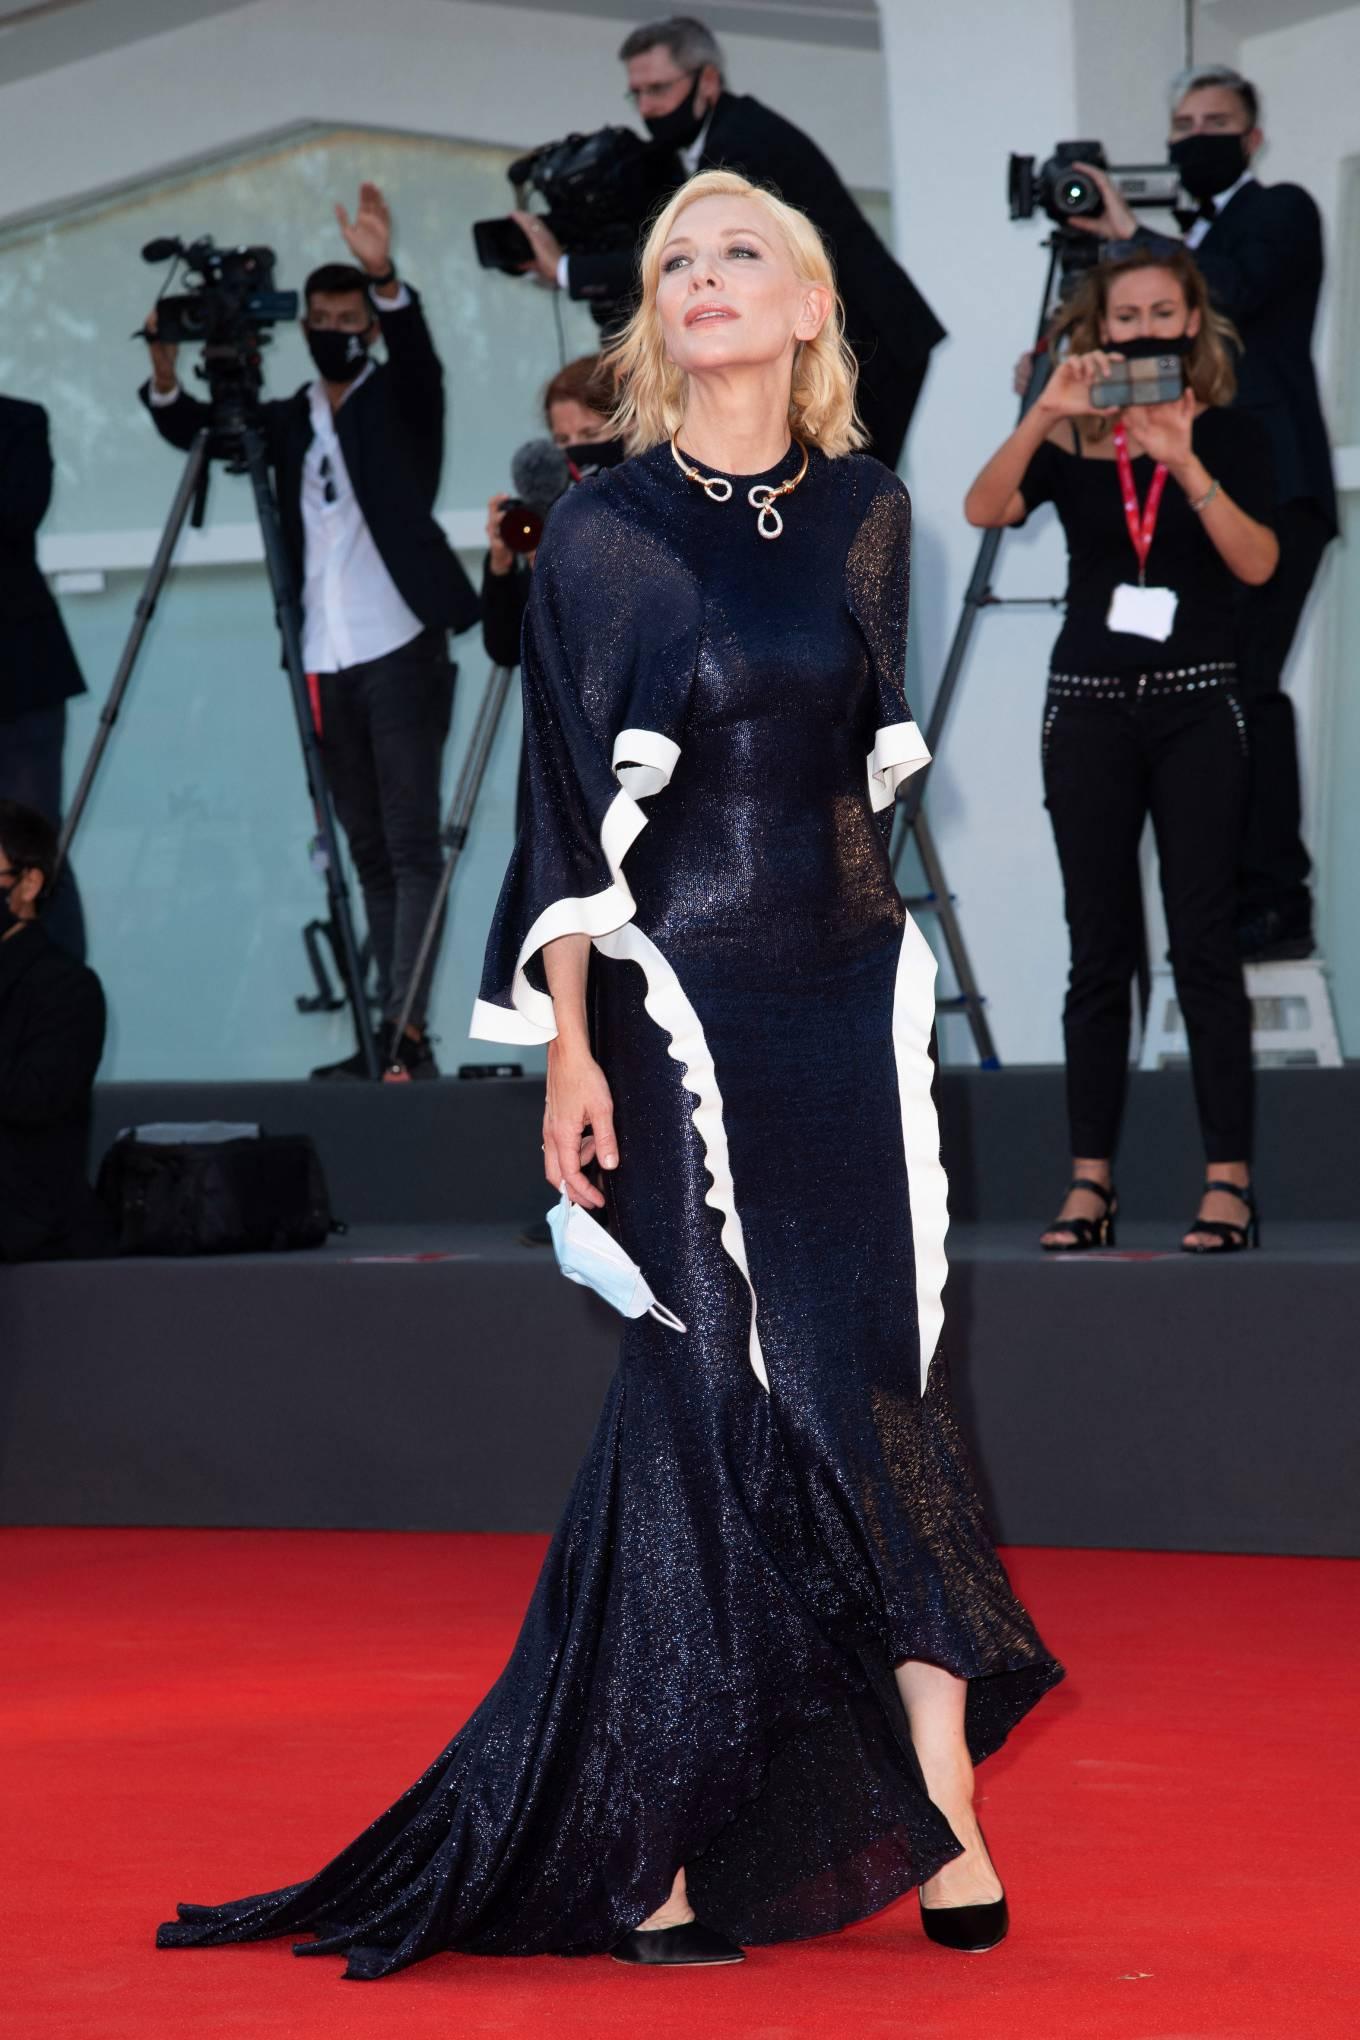 Cate Blanchett 2020 : Cate Blanchett attending Opening Ceremony at 2020 Venice International Film Festival – Italy-16